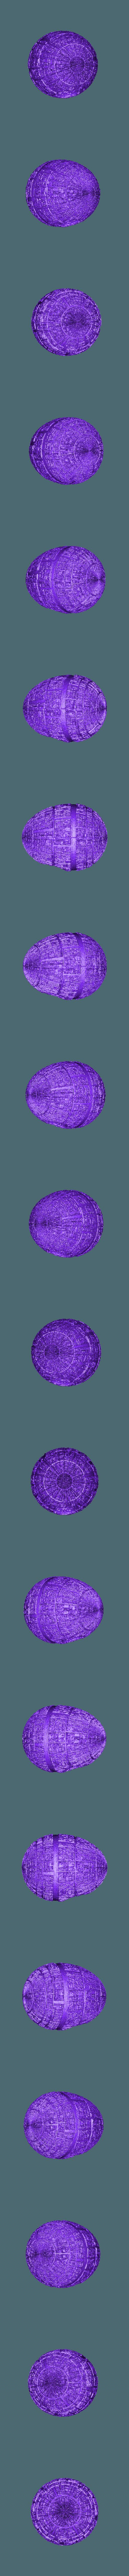 JG_death_star_easter_egg_bottom_NO-stand.stl Download free STL file EggStar (Easter Egg Death Star) • 3D printing object, c47